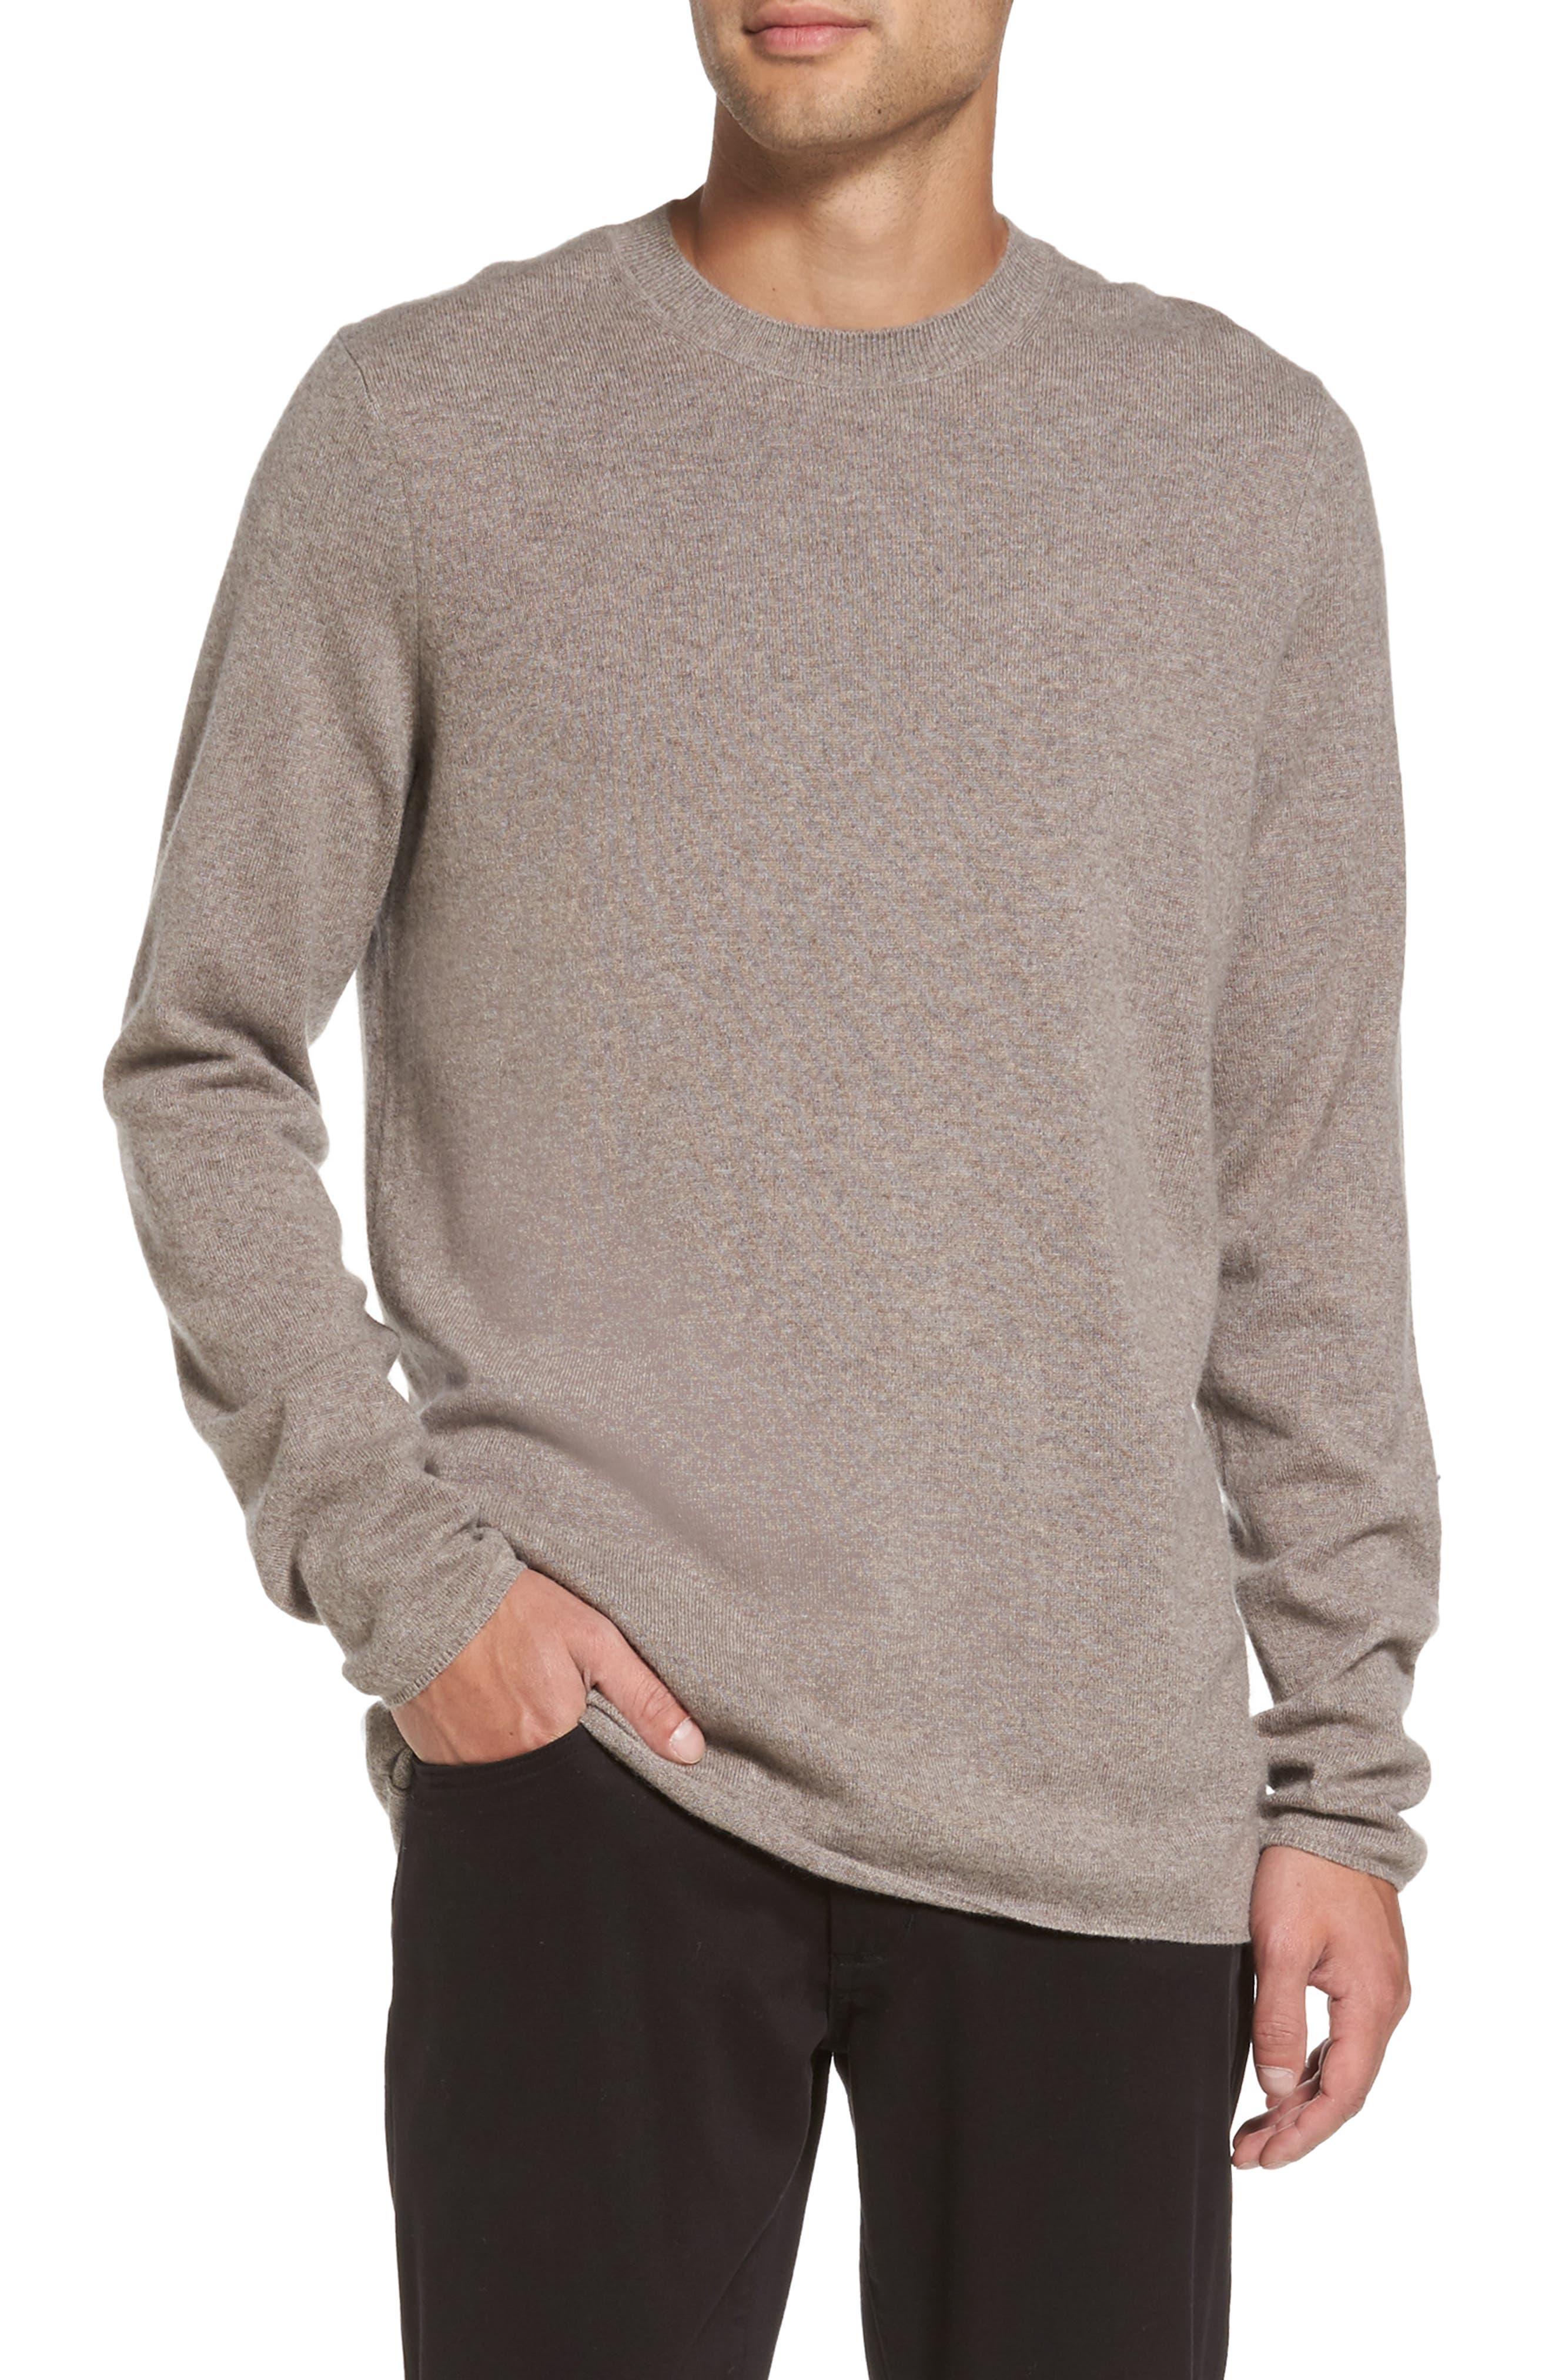 Alternate Image 1 Selected - Vince Regular Fit Crewneck Sweater